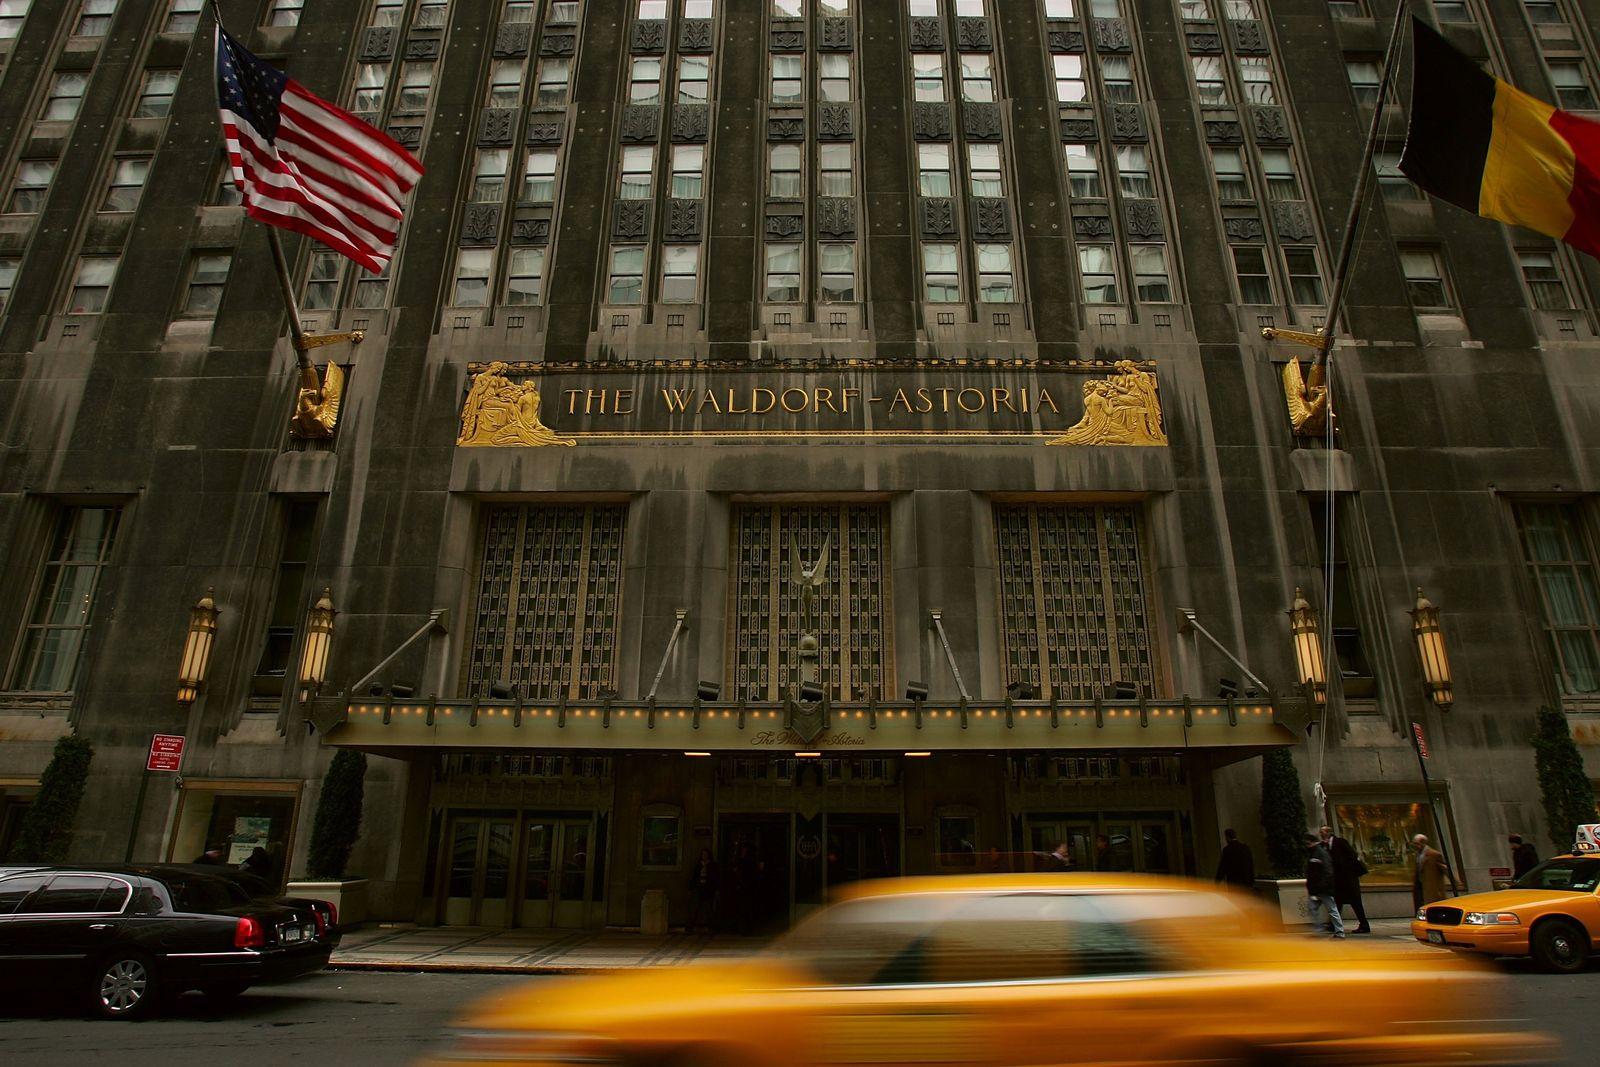 Waldorf Astoria/ Hilton Hotel/ New York